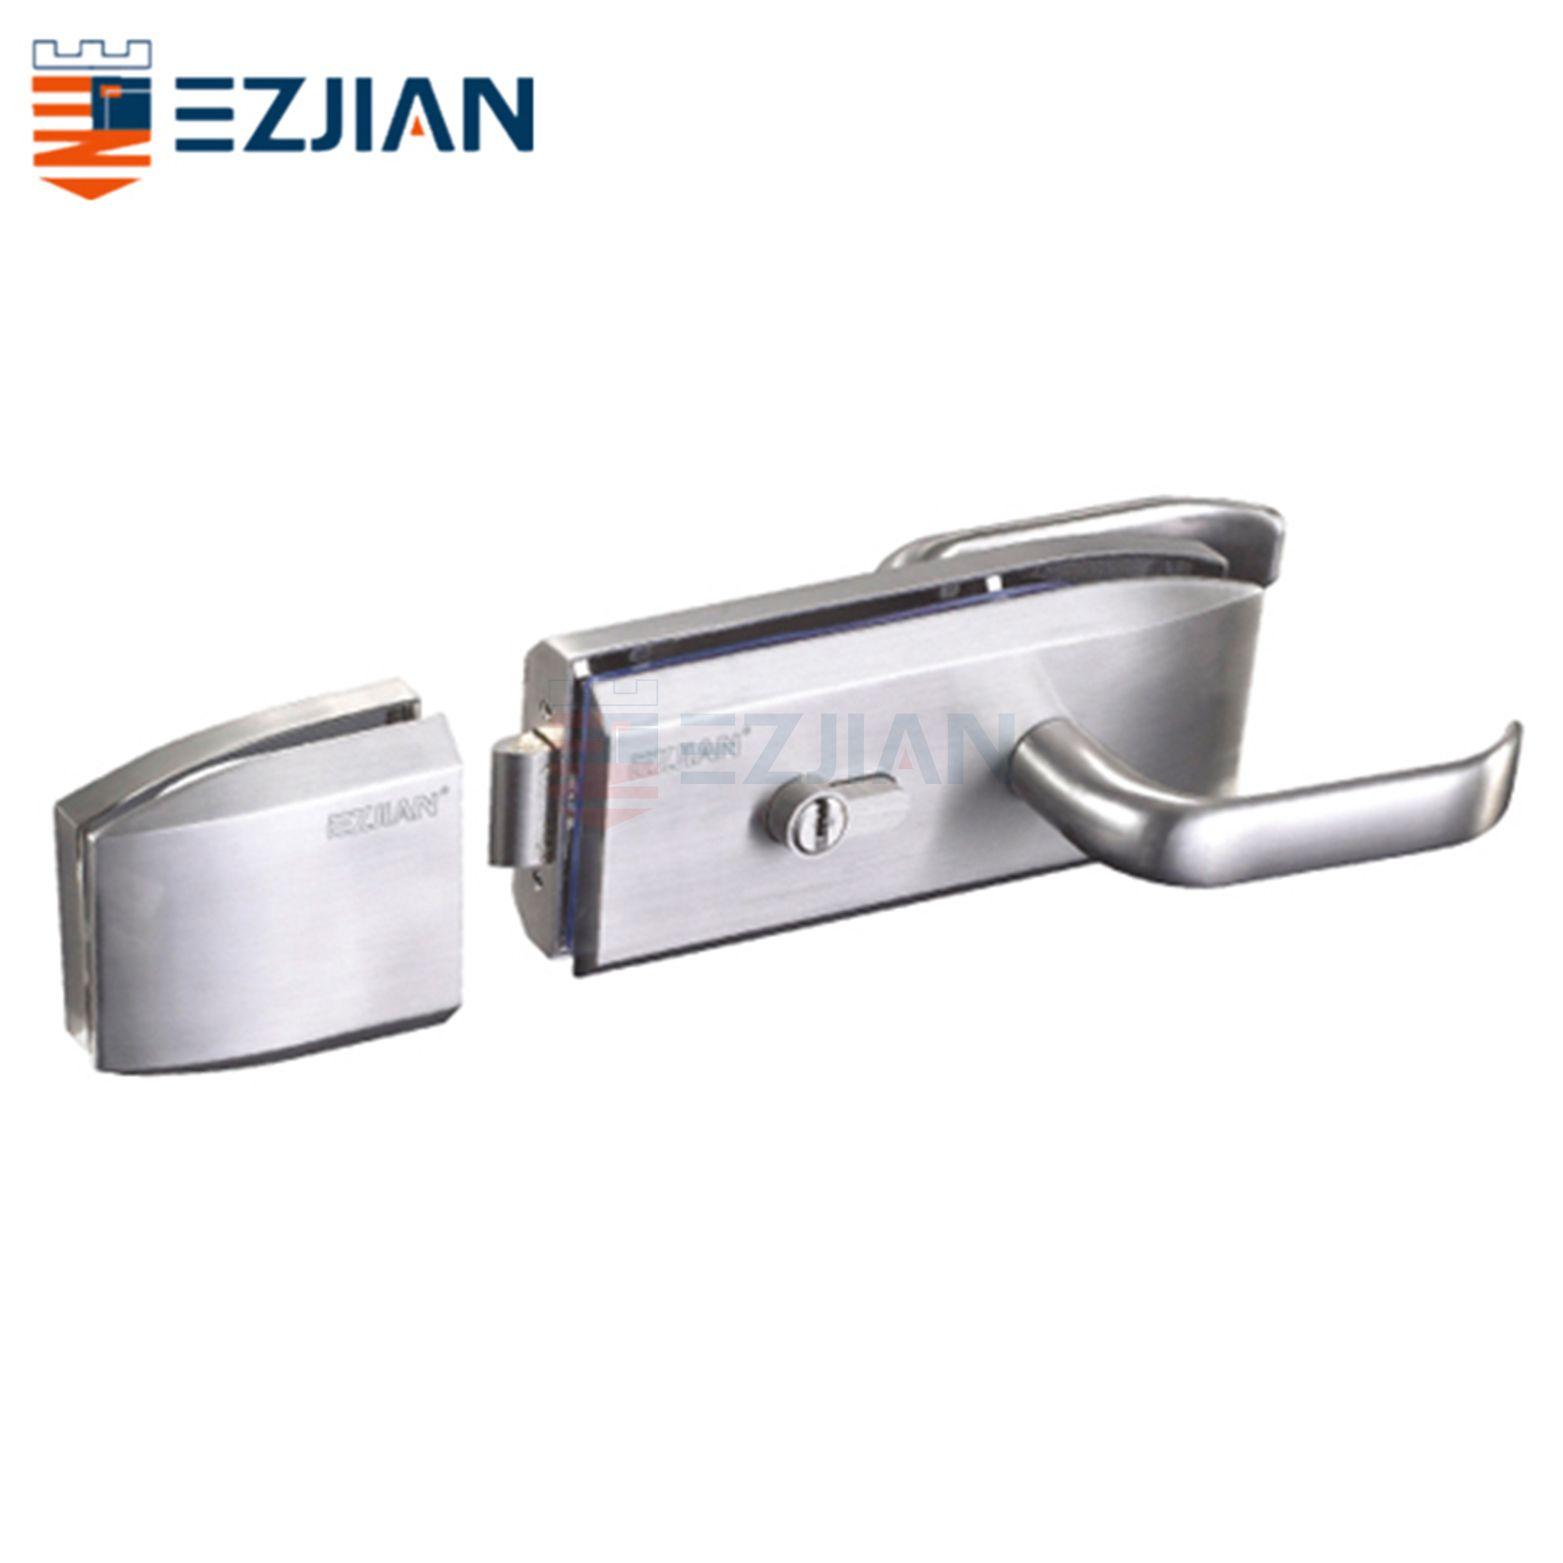 Glass Gate Lock EJ-9004